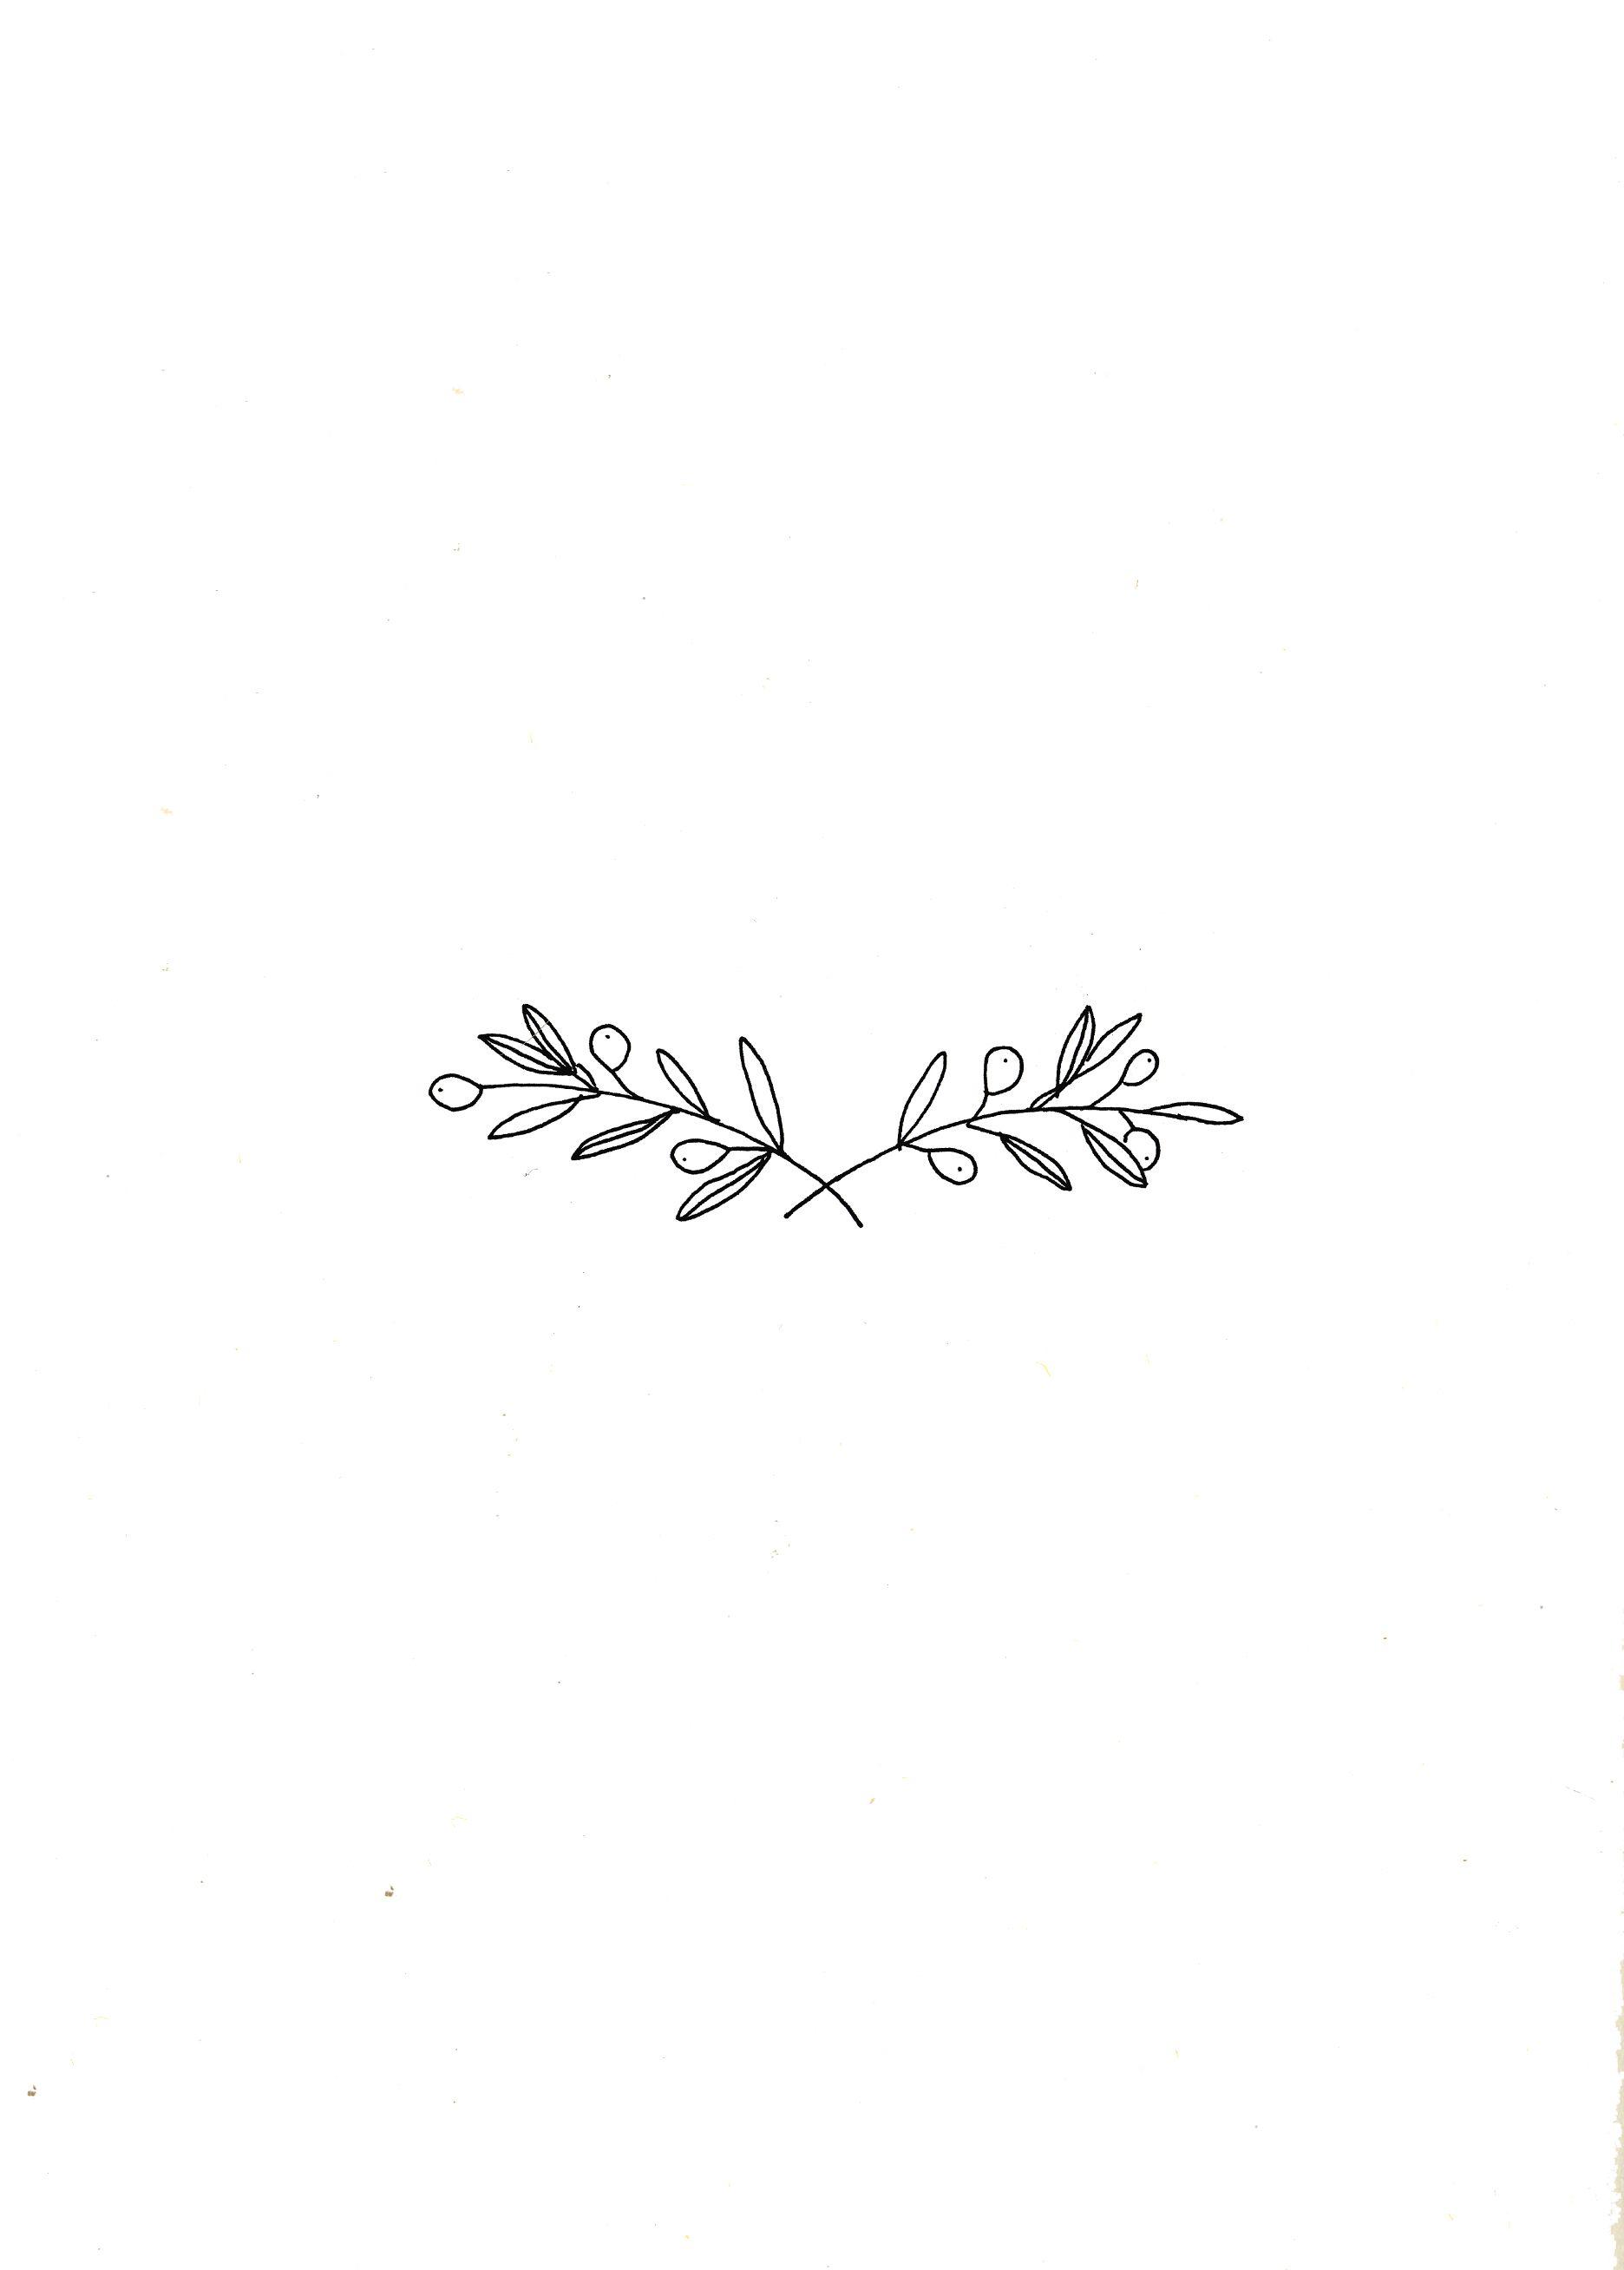 Simplicity By Ryn Frank Cute Tattoos Olive Branch Tattoo Tattoo Designs